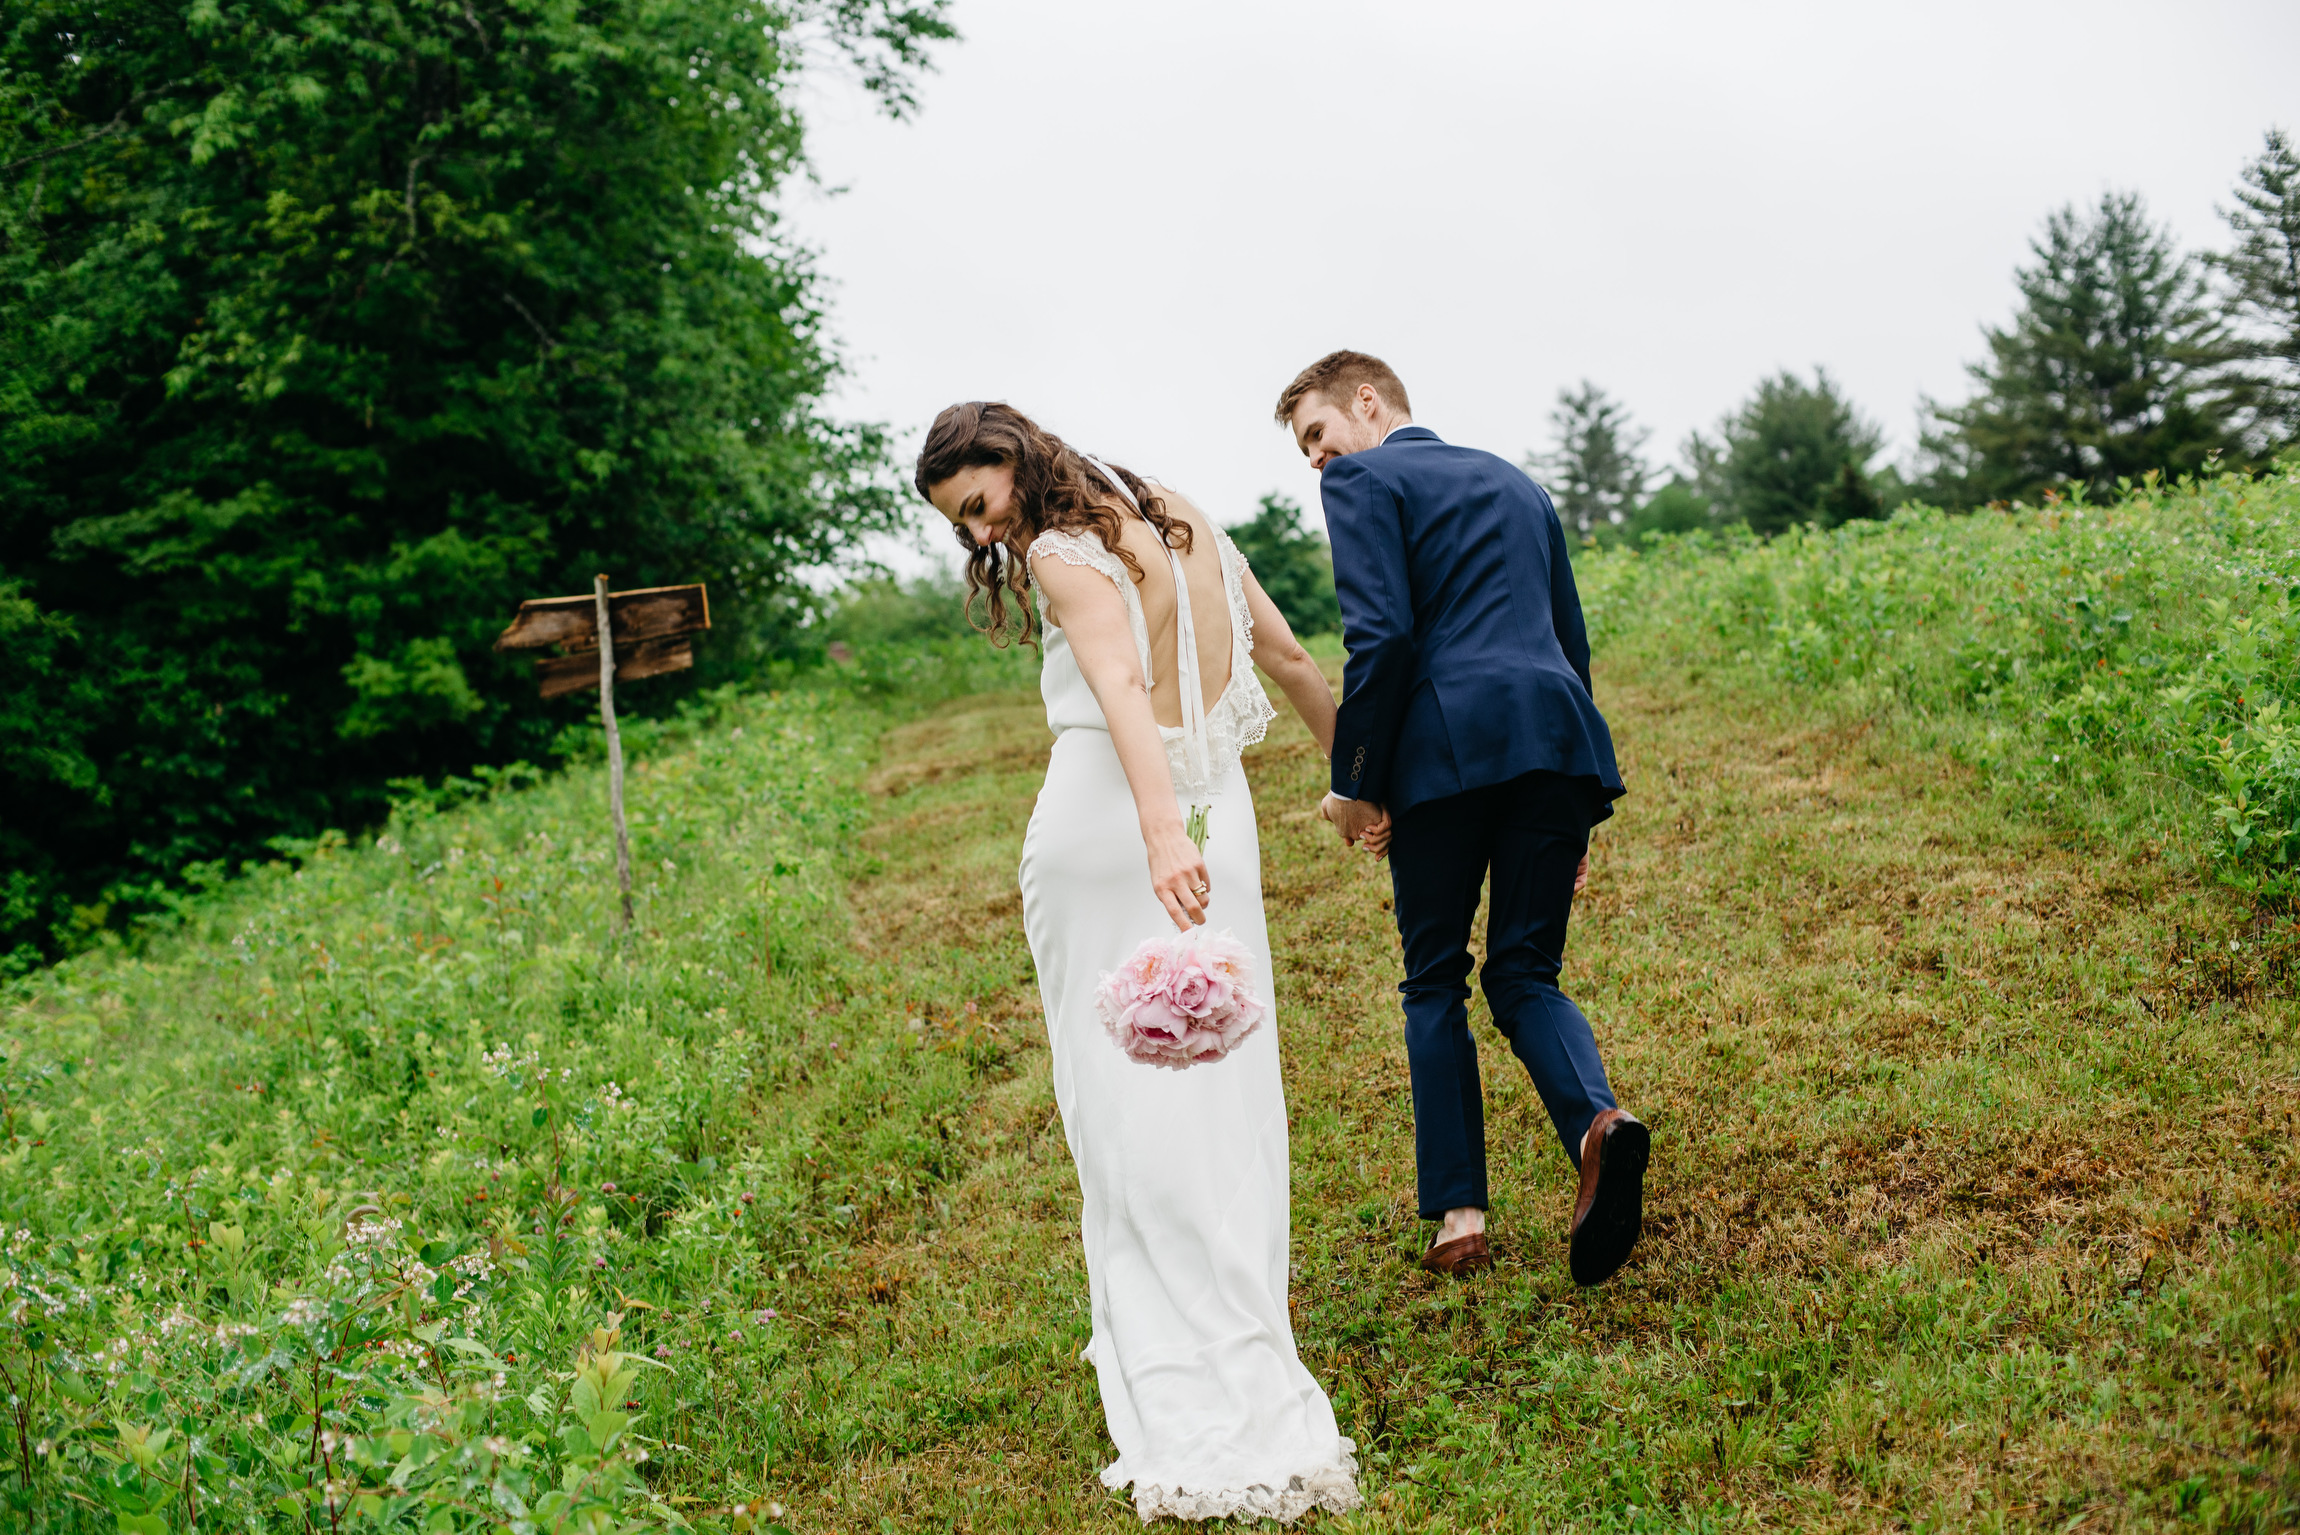 vermont_farm_wedding_photos_mikhail_glabetS_49.JPG